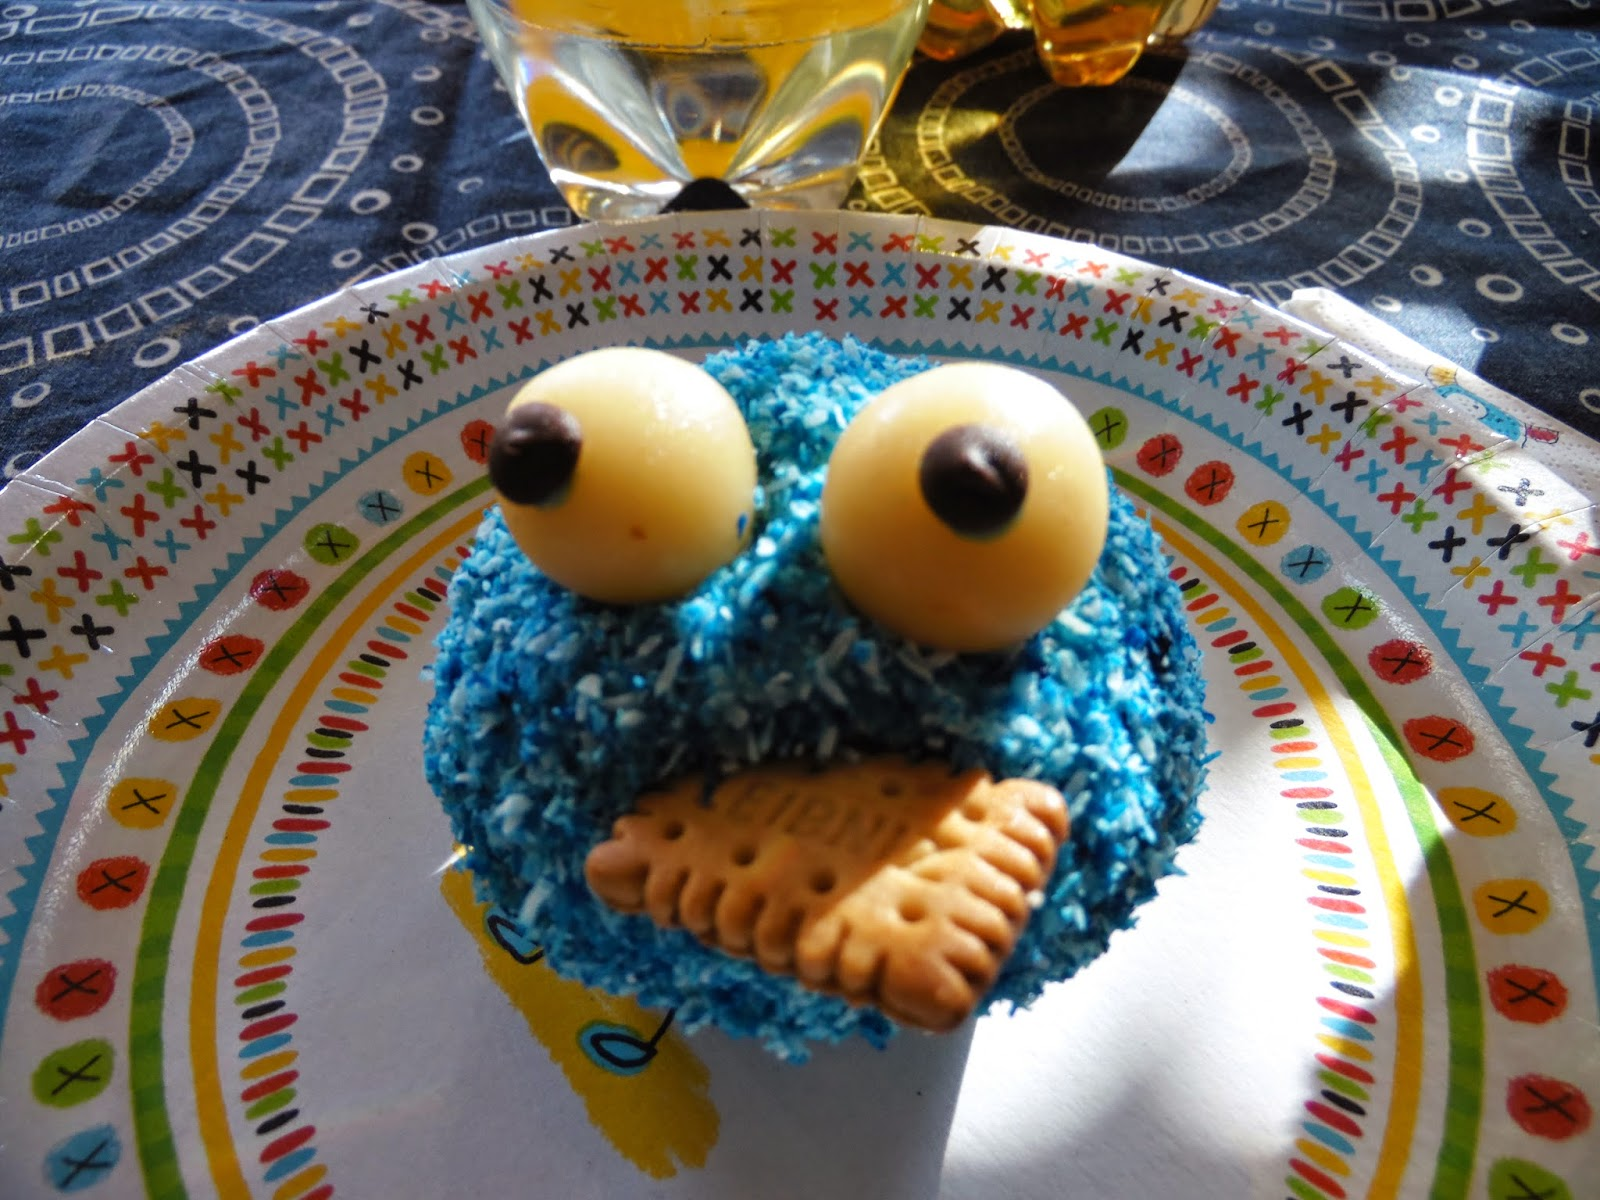 Frinis Kreative Zauberkuche Kochen Backen Krumelmonster Muffins